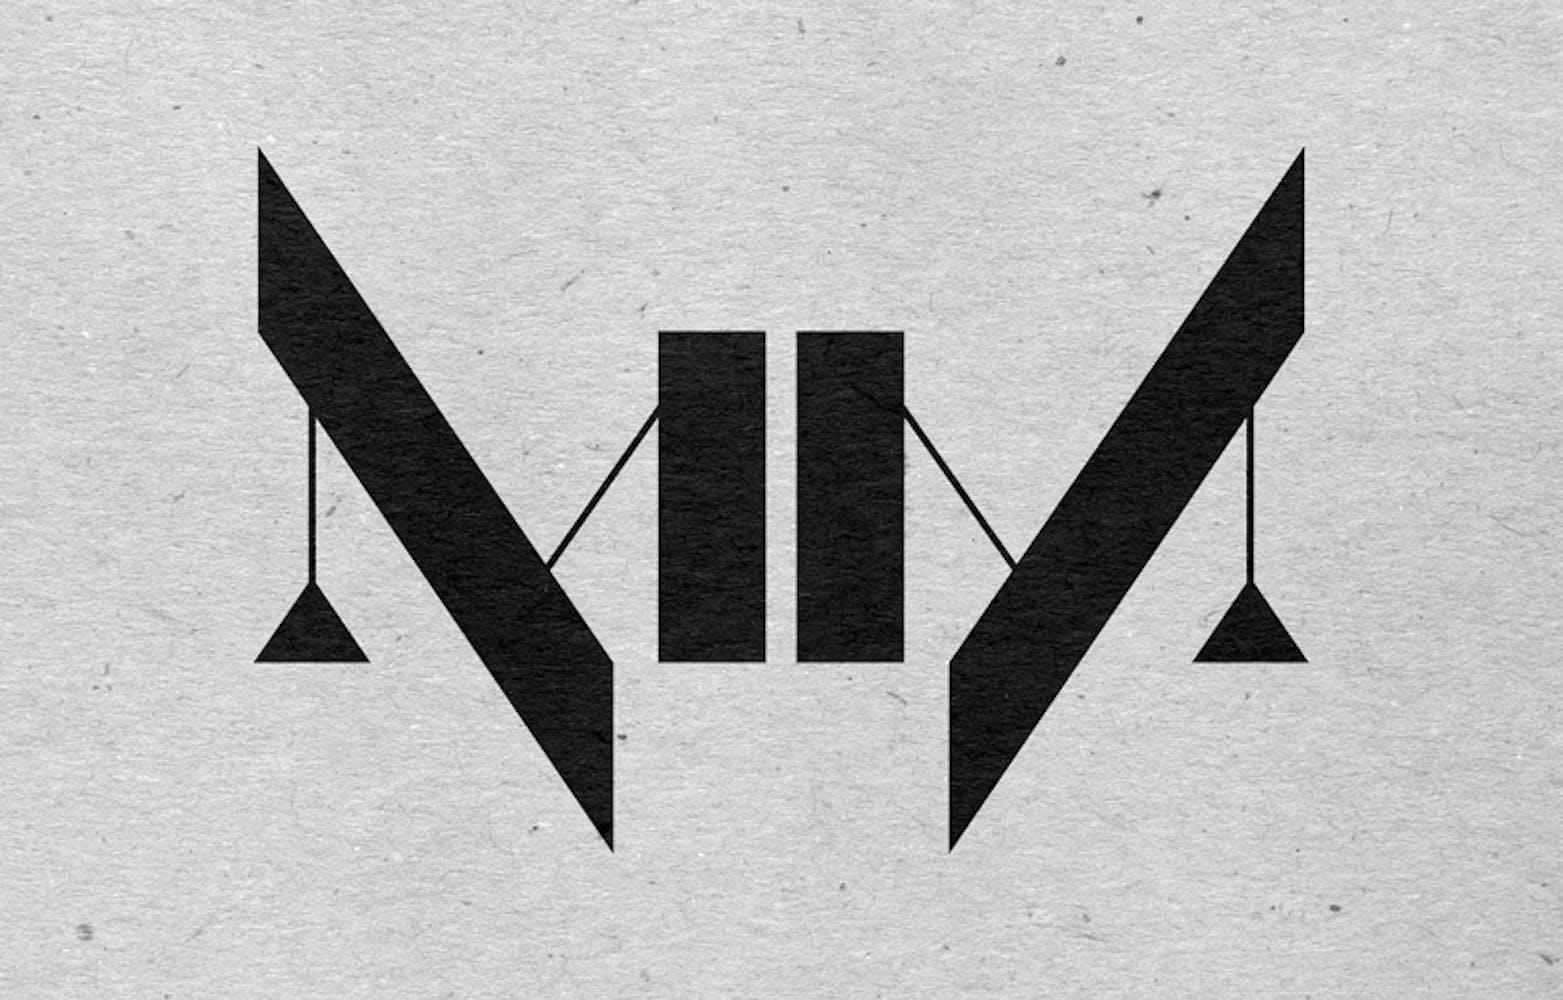 Geometric logo fo band Nine Inch Nails